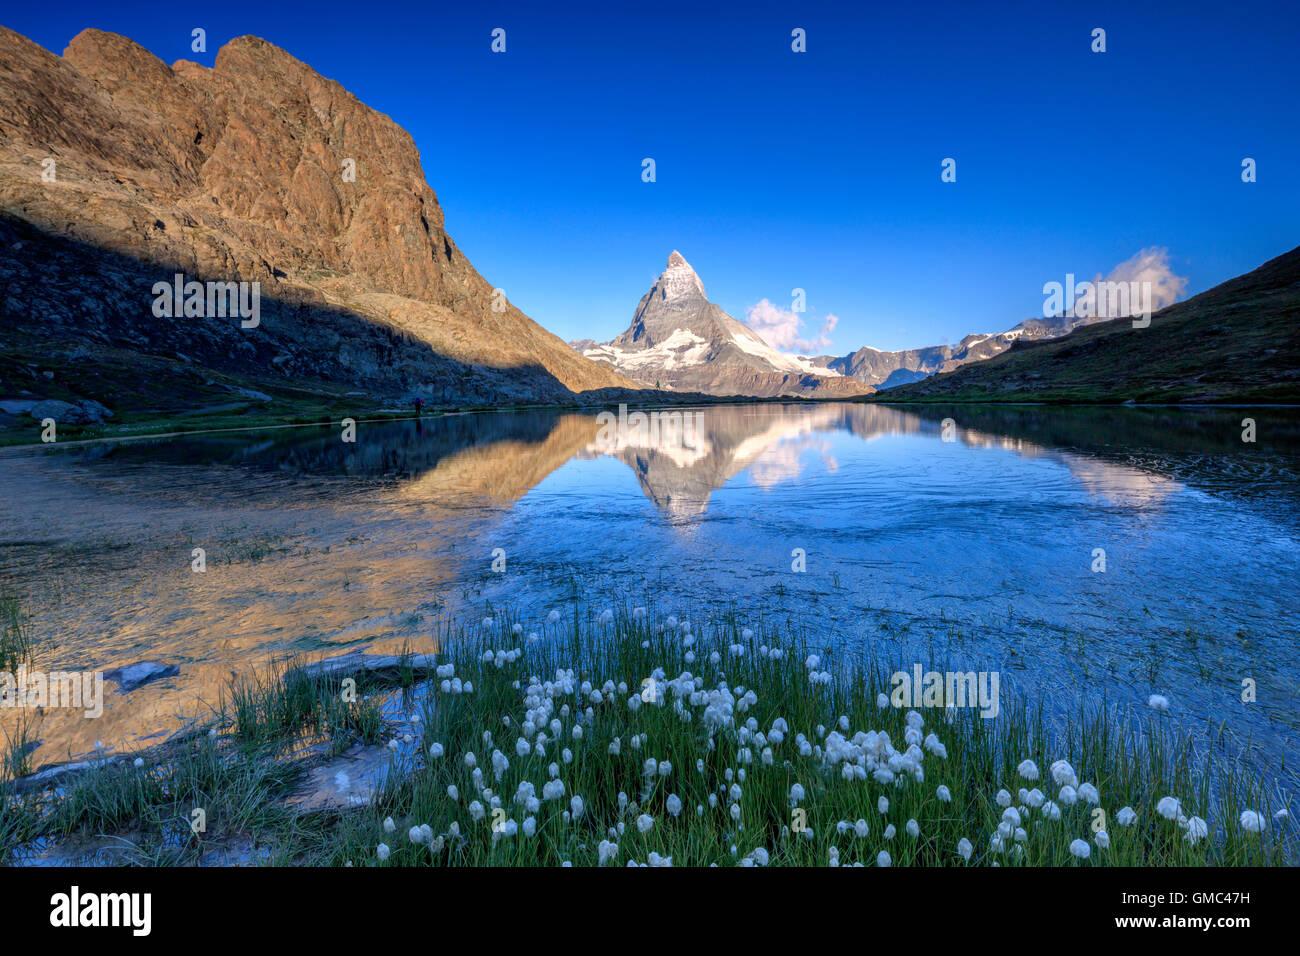 Cotton grass frame the Matterhorn reflected in Lake Stellisee at dawn Zermatt Canton of Valais Switzerland Europe - Stock Image